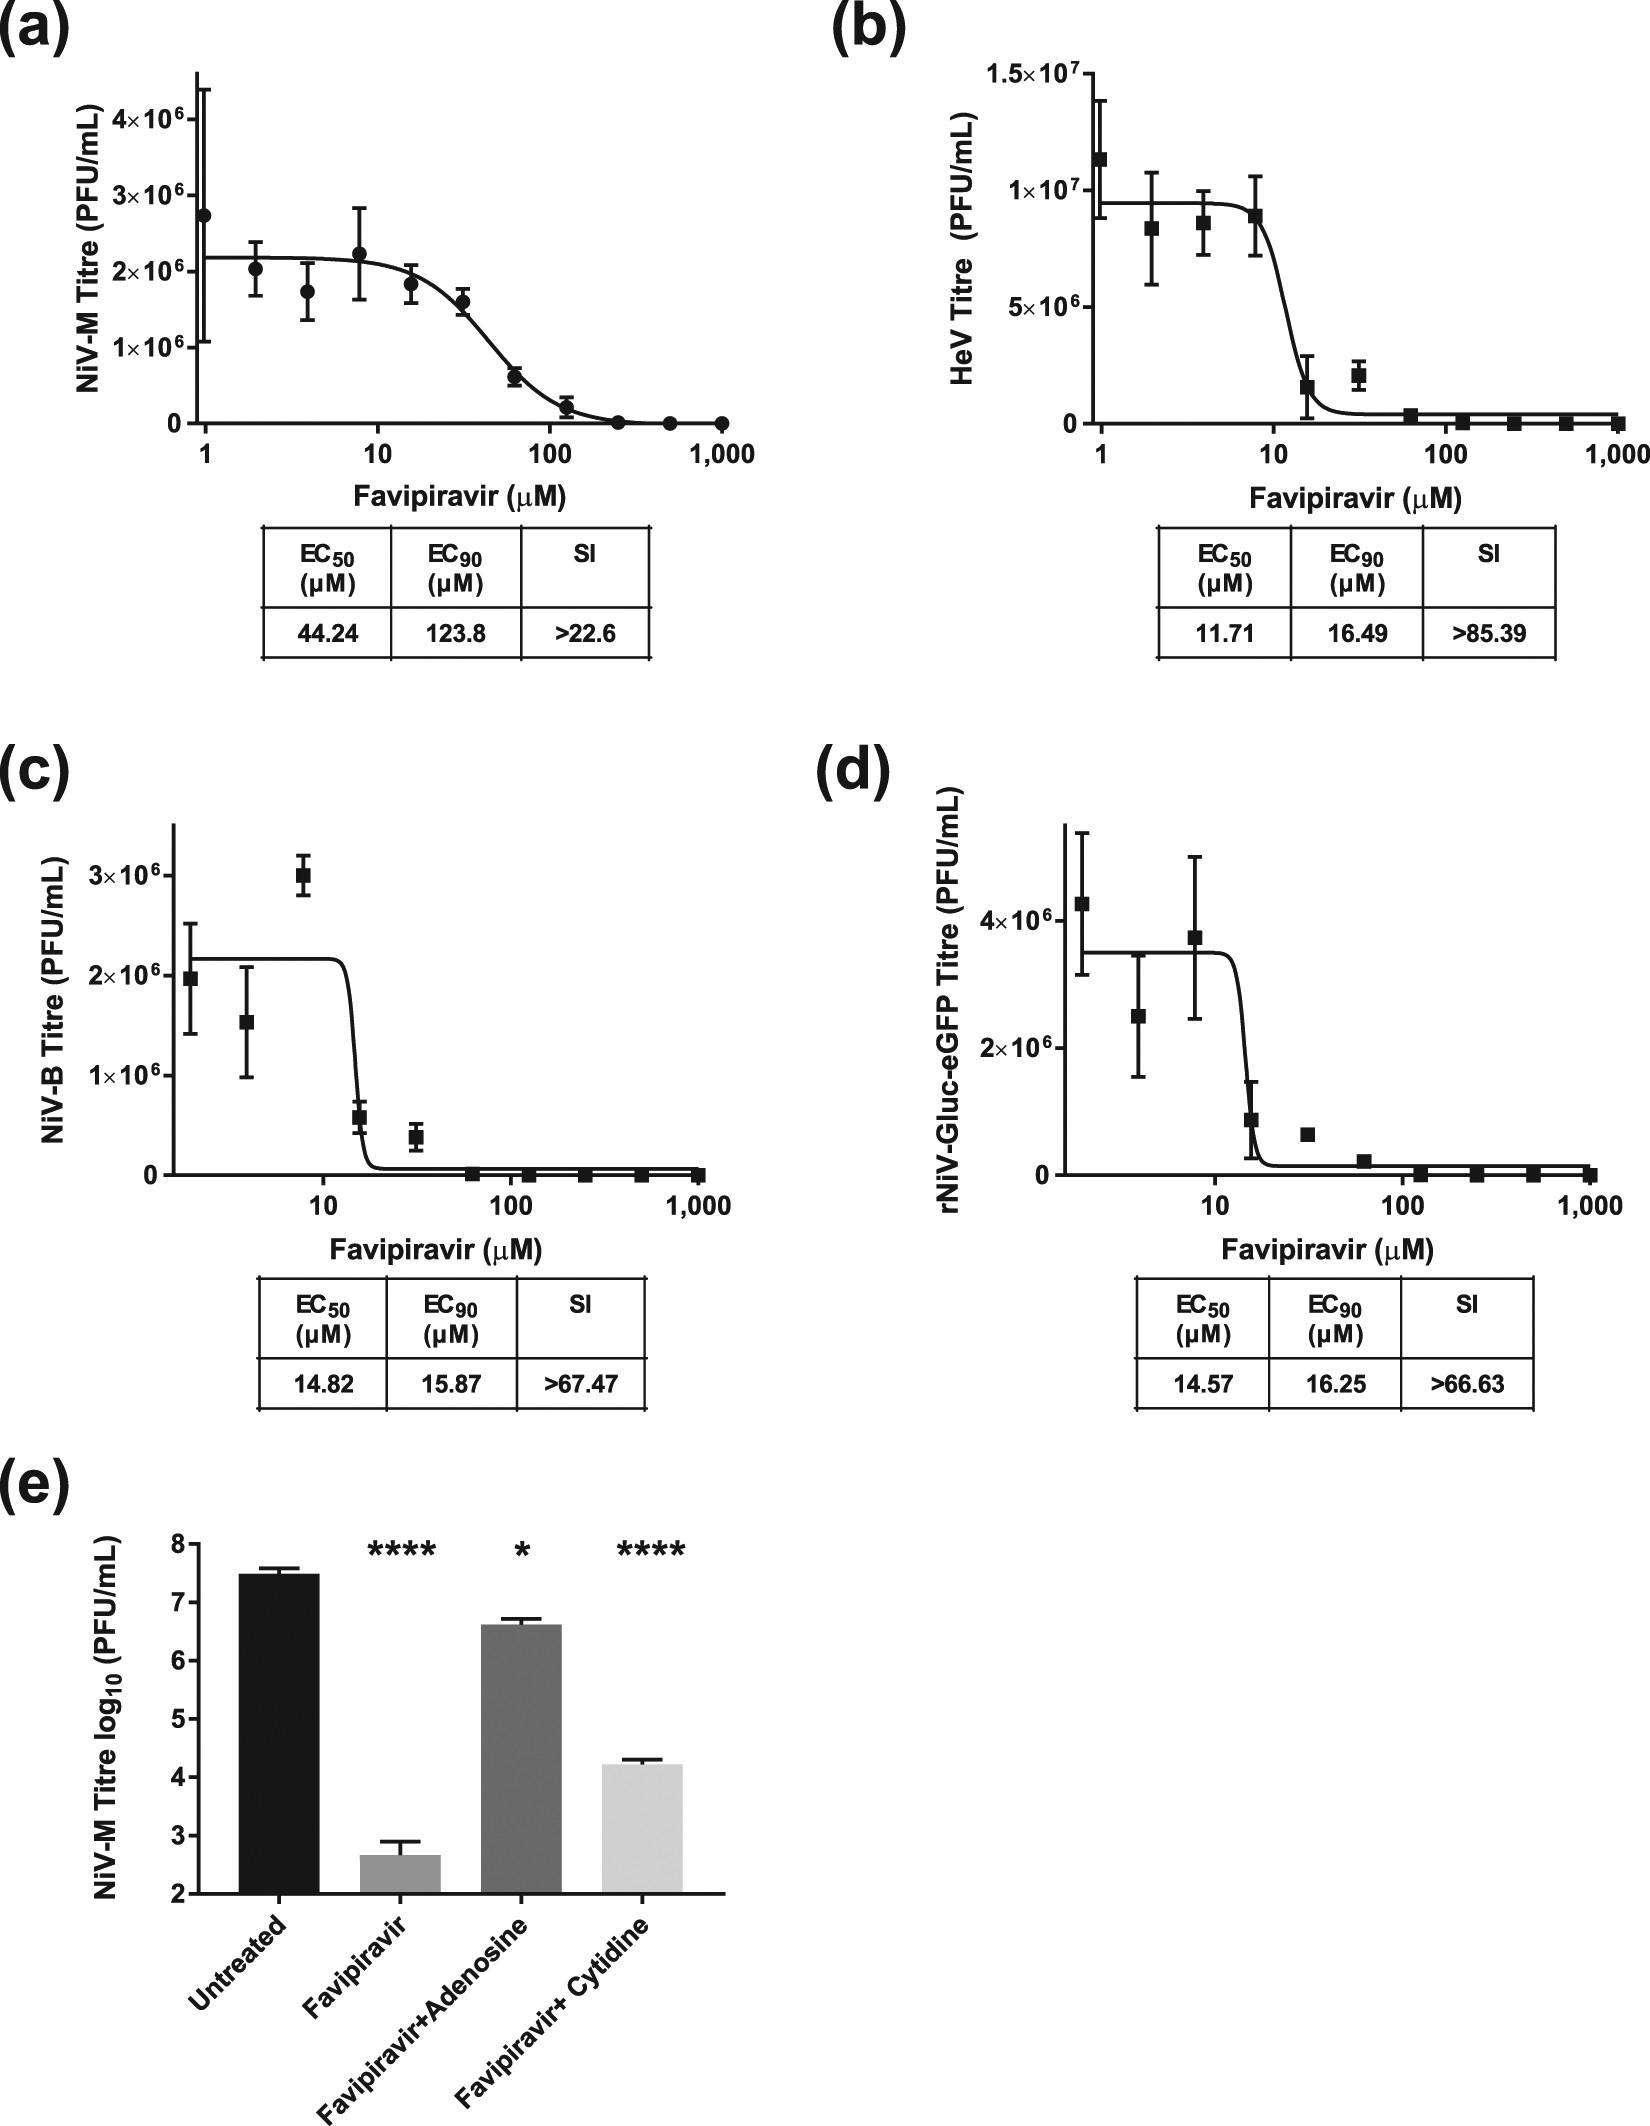 Favipiravir (T-705) protects against Nipah virus infection